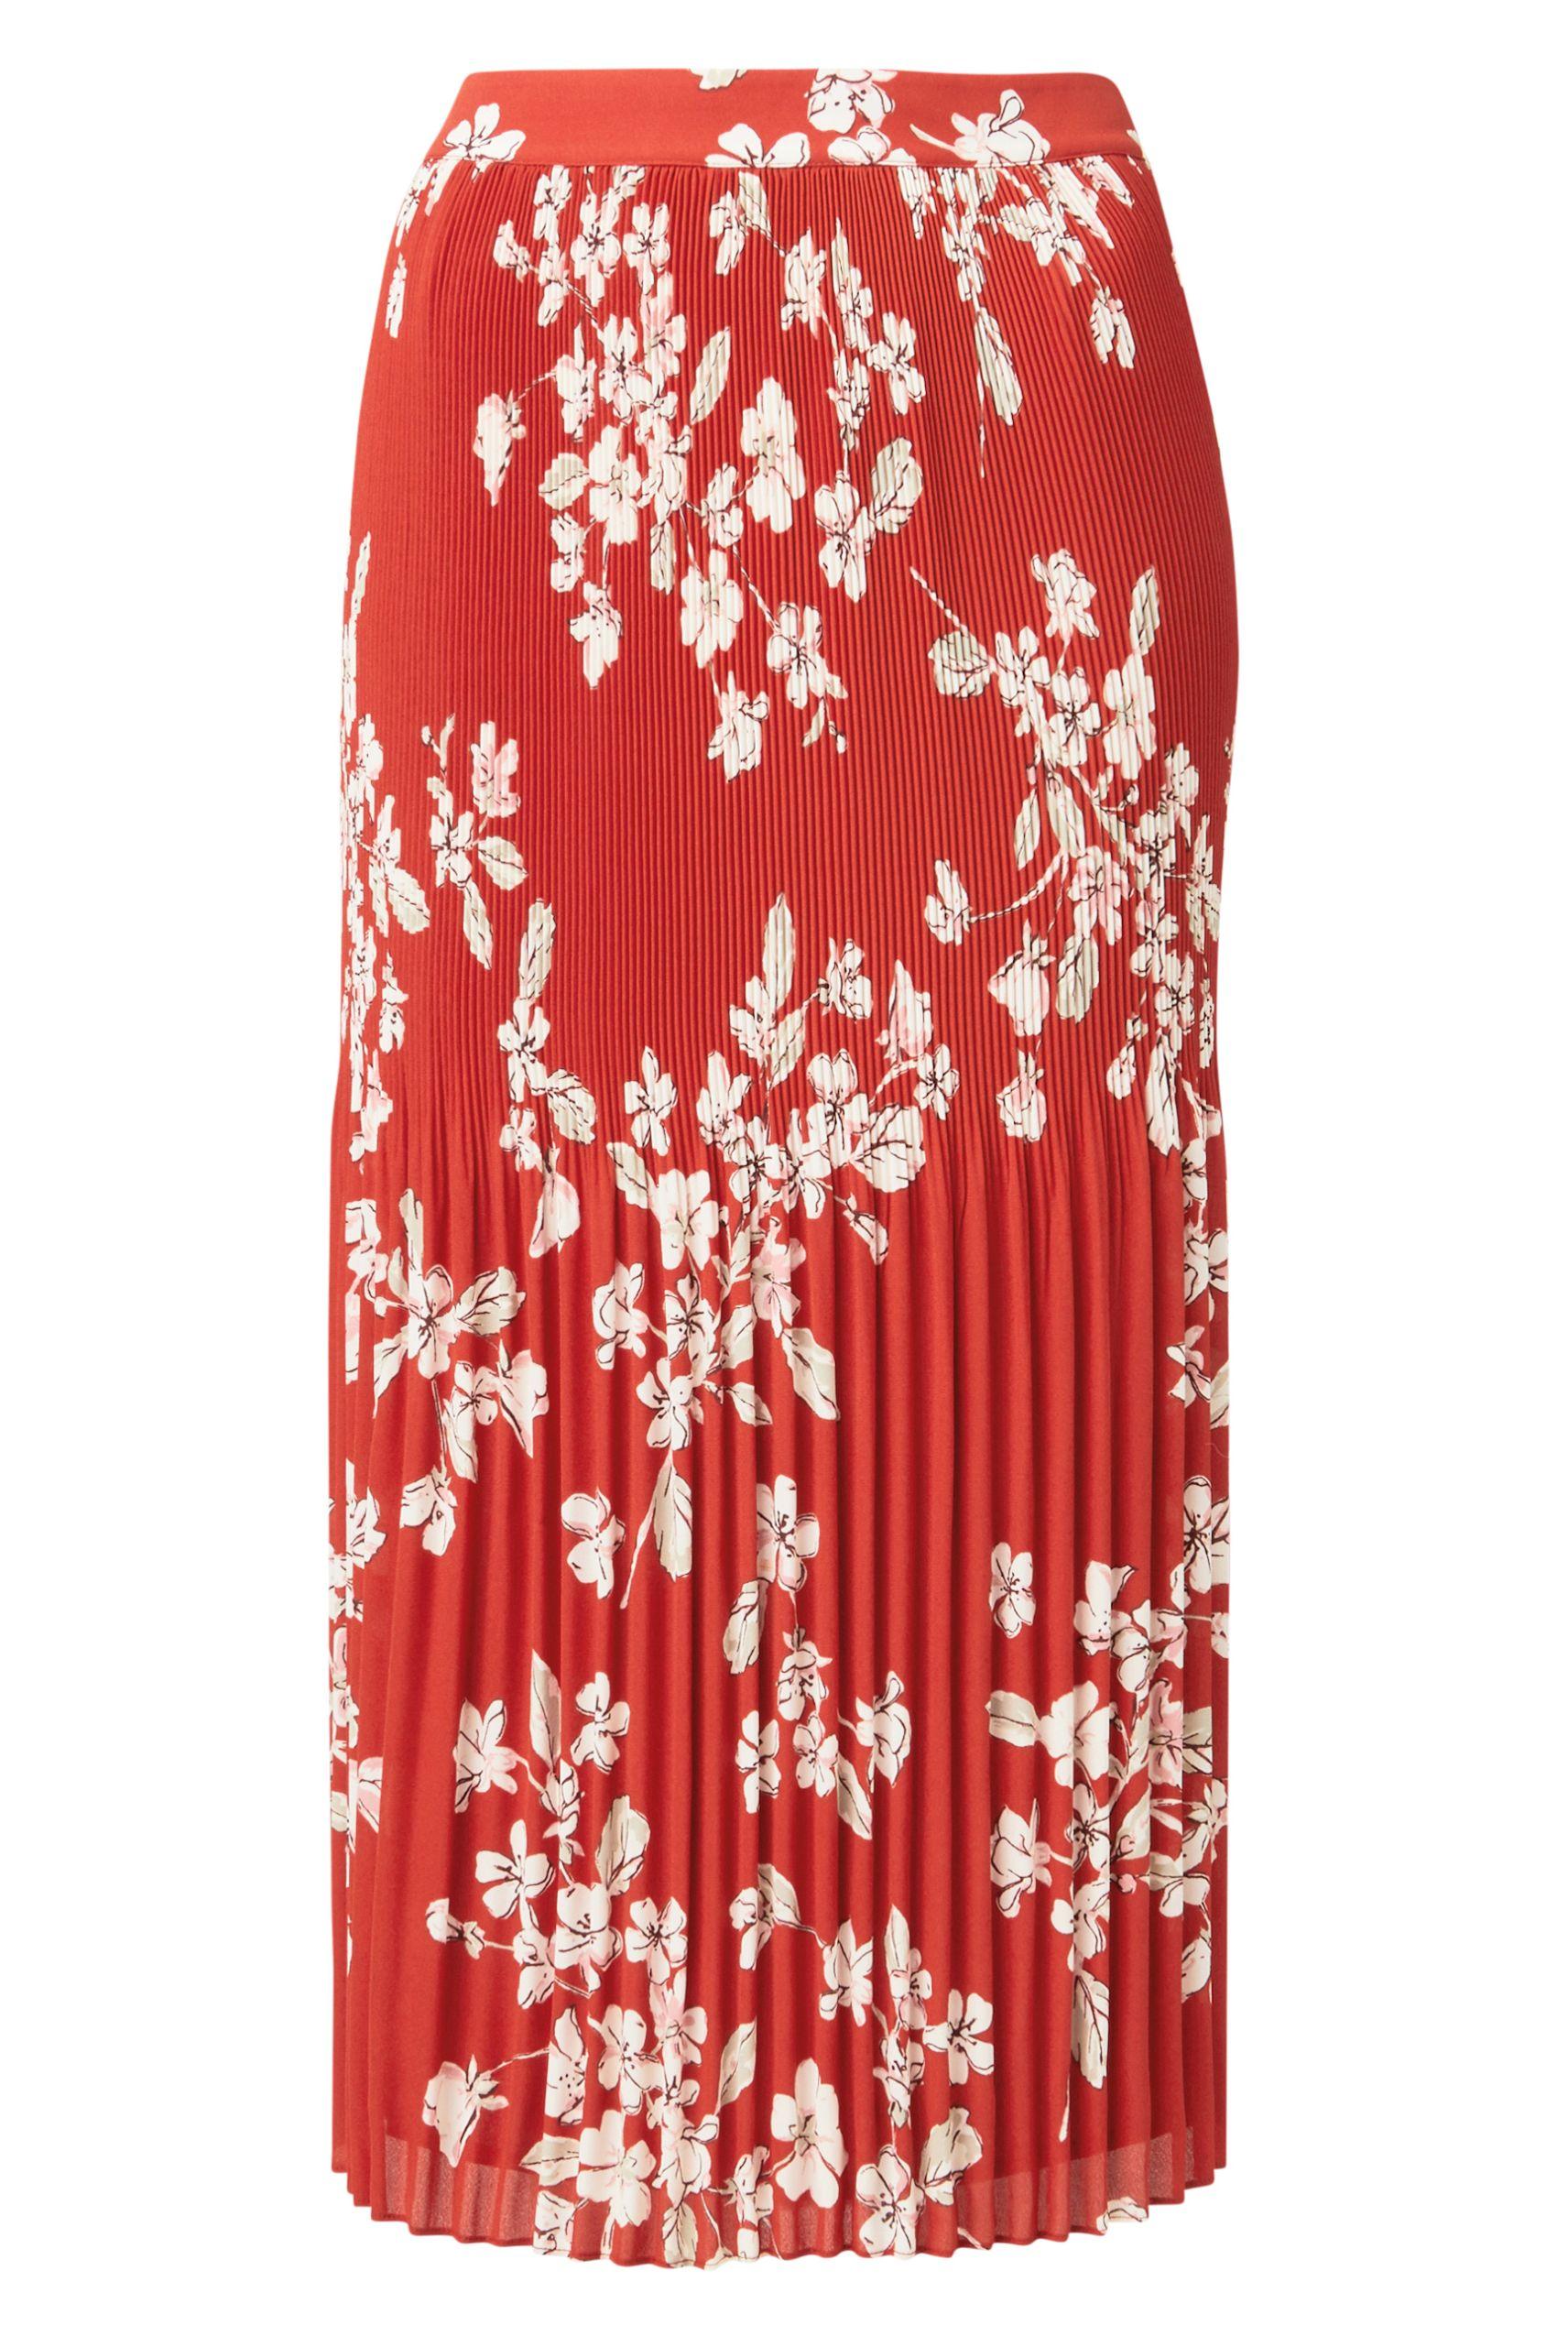 60212662_Witchery Midi Plisse Skirt, RRP$149.95